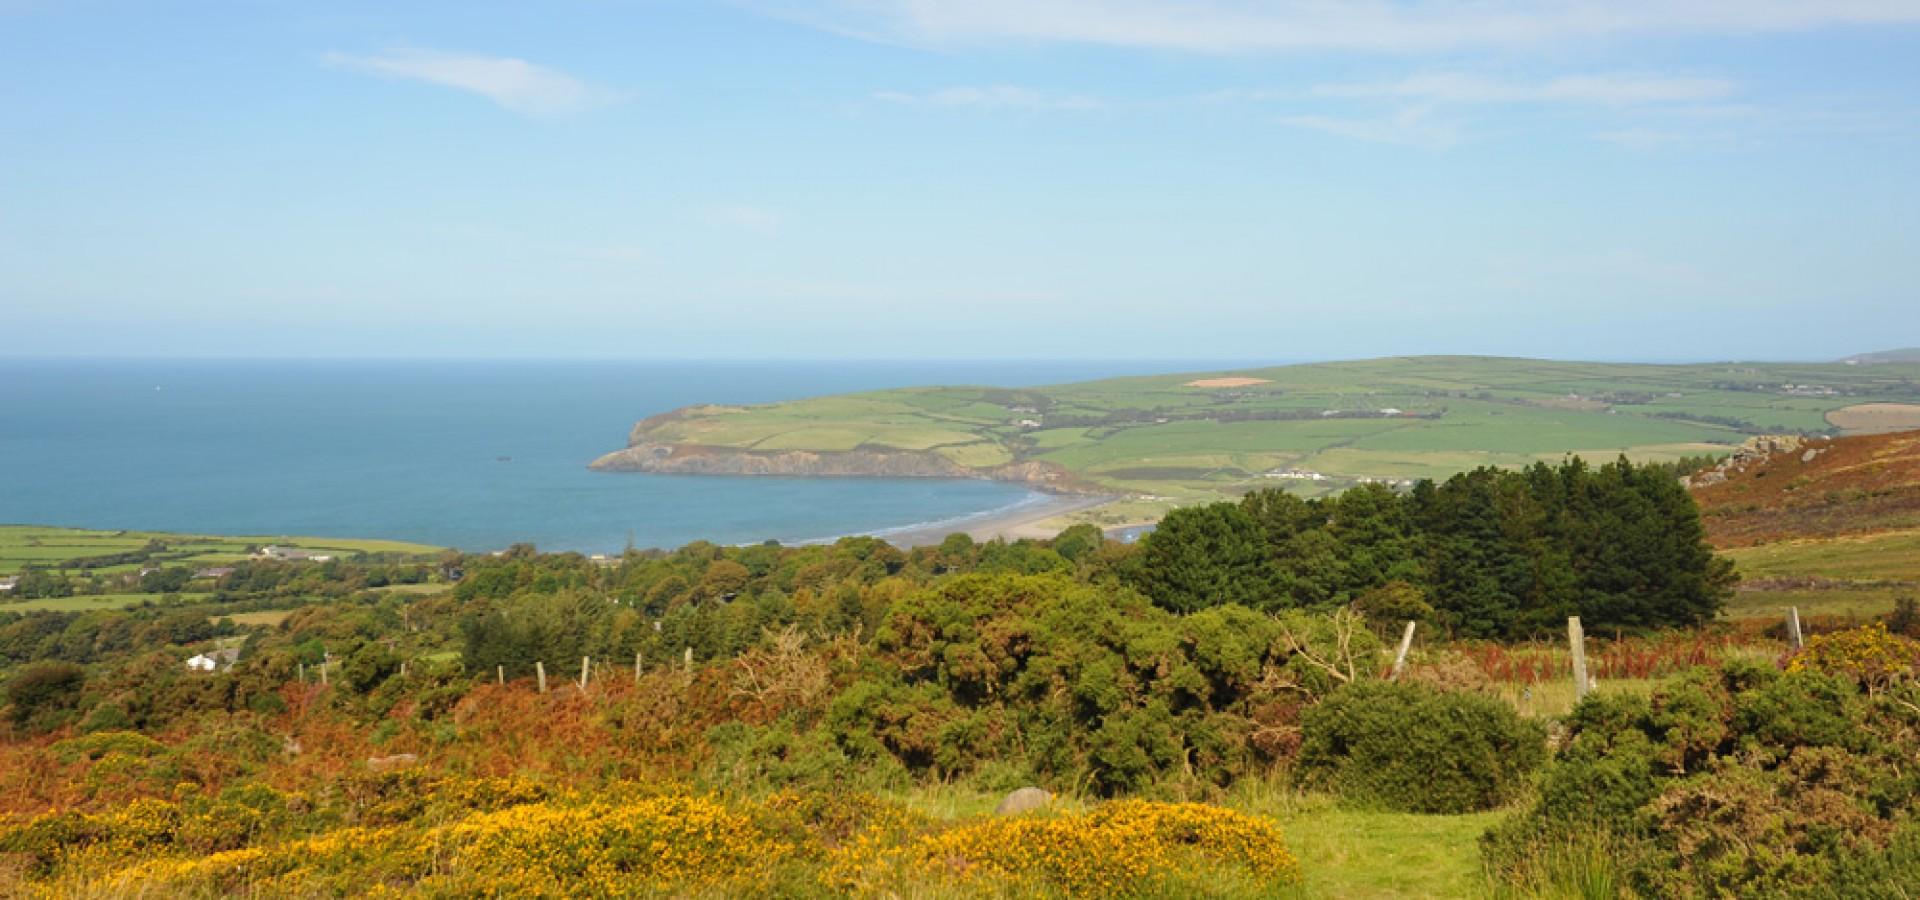 Newport Pembrokeshire Top Tourist